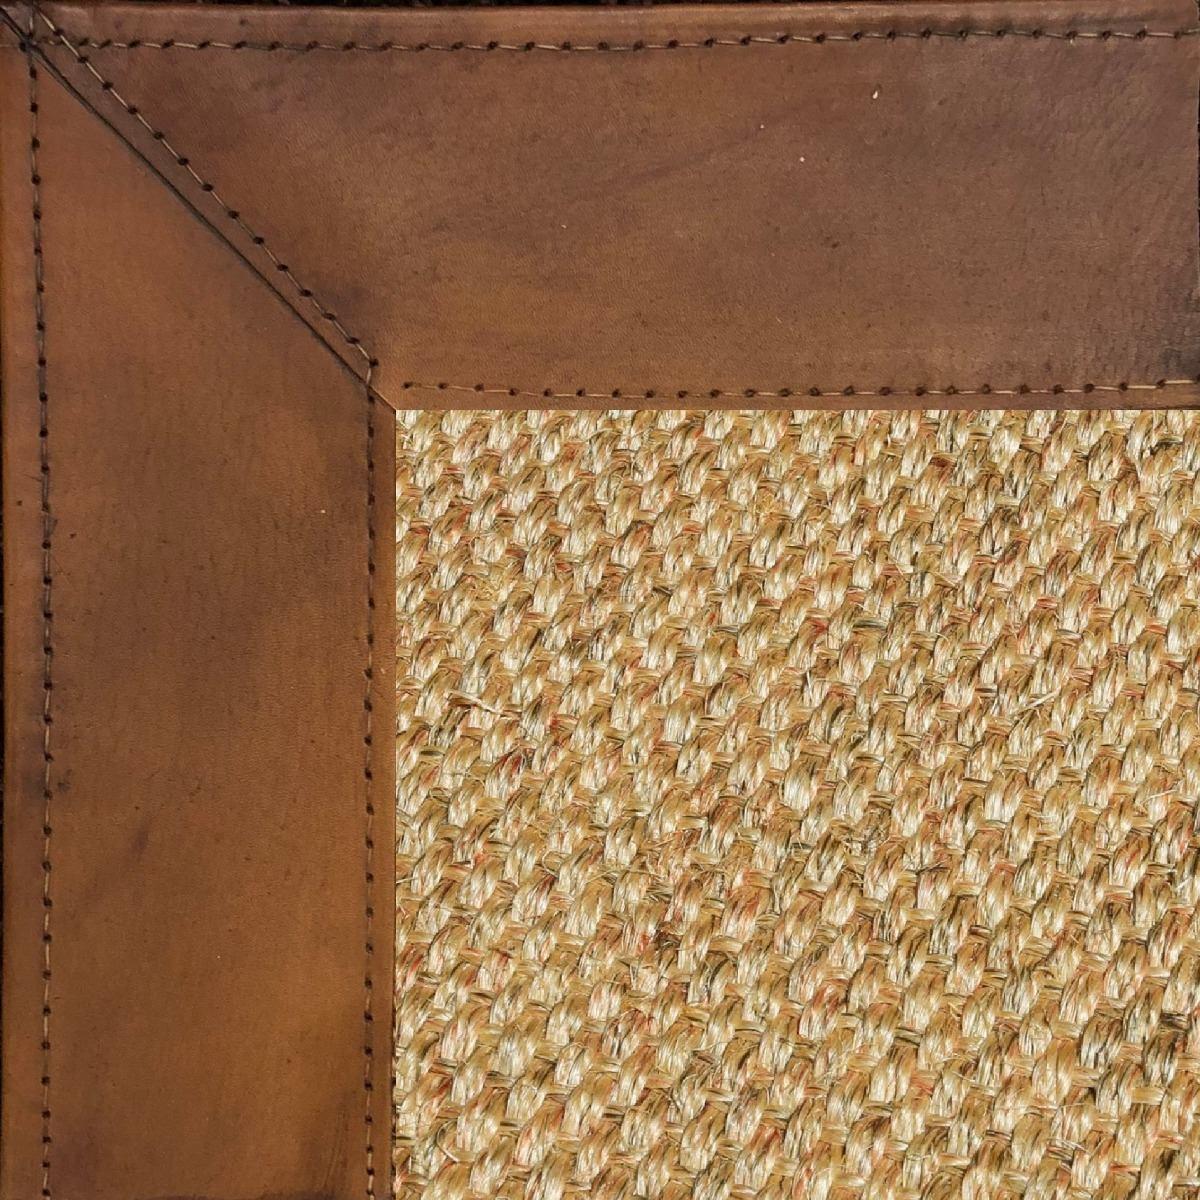 alfombra sisal sintético - guarda cuero (5 cm) - 2.00 x 2.50 - u$s